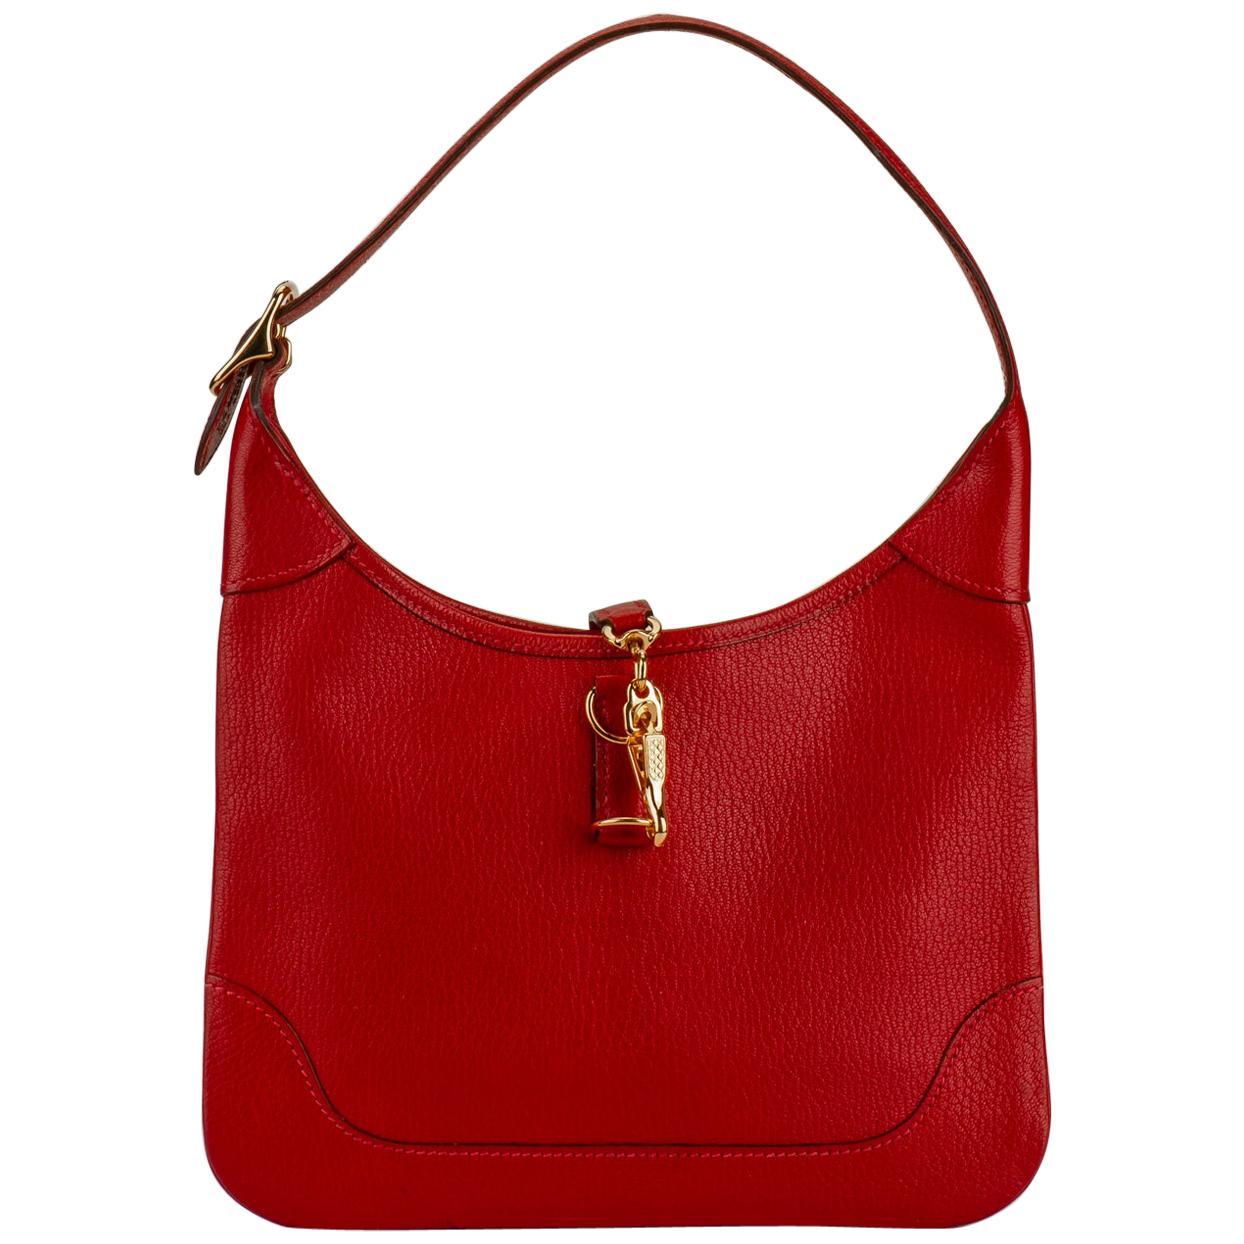 Hermes Red Chevre Mini Trim Bag